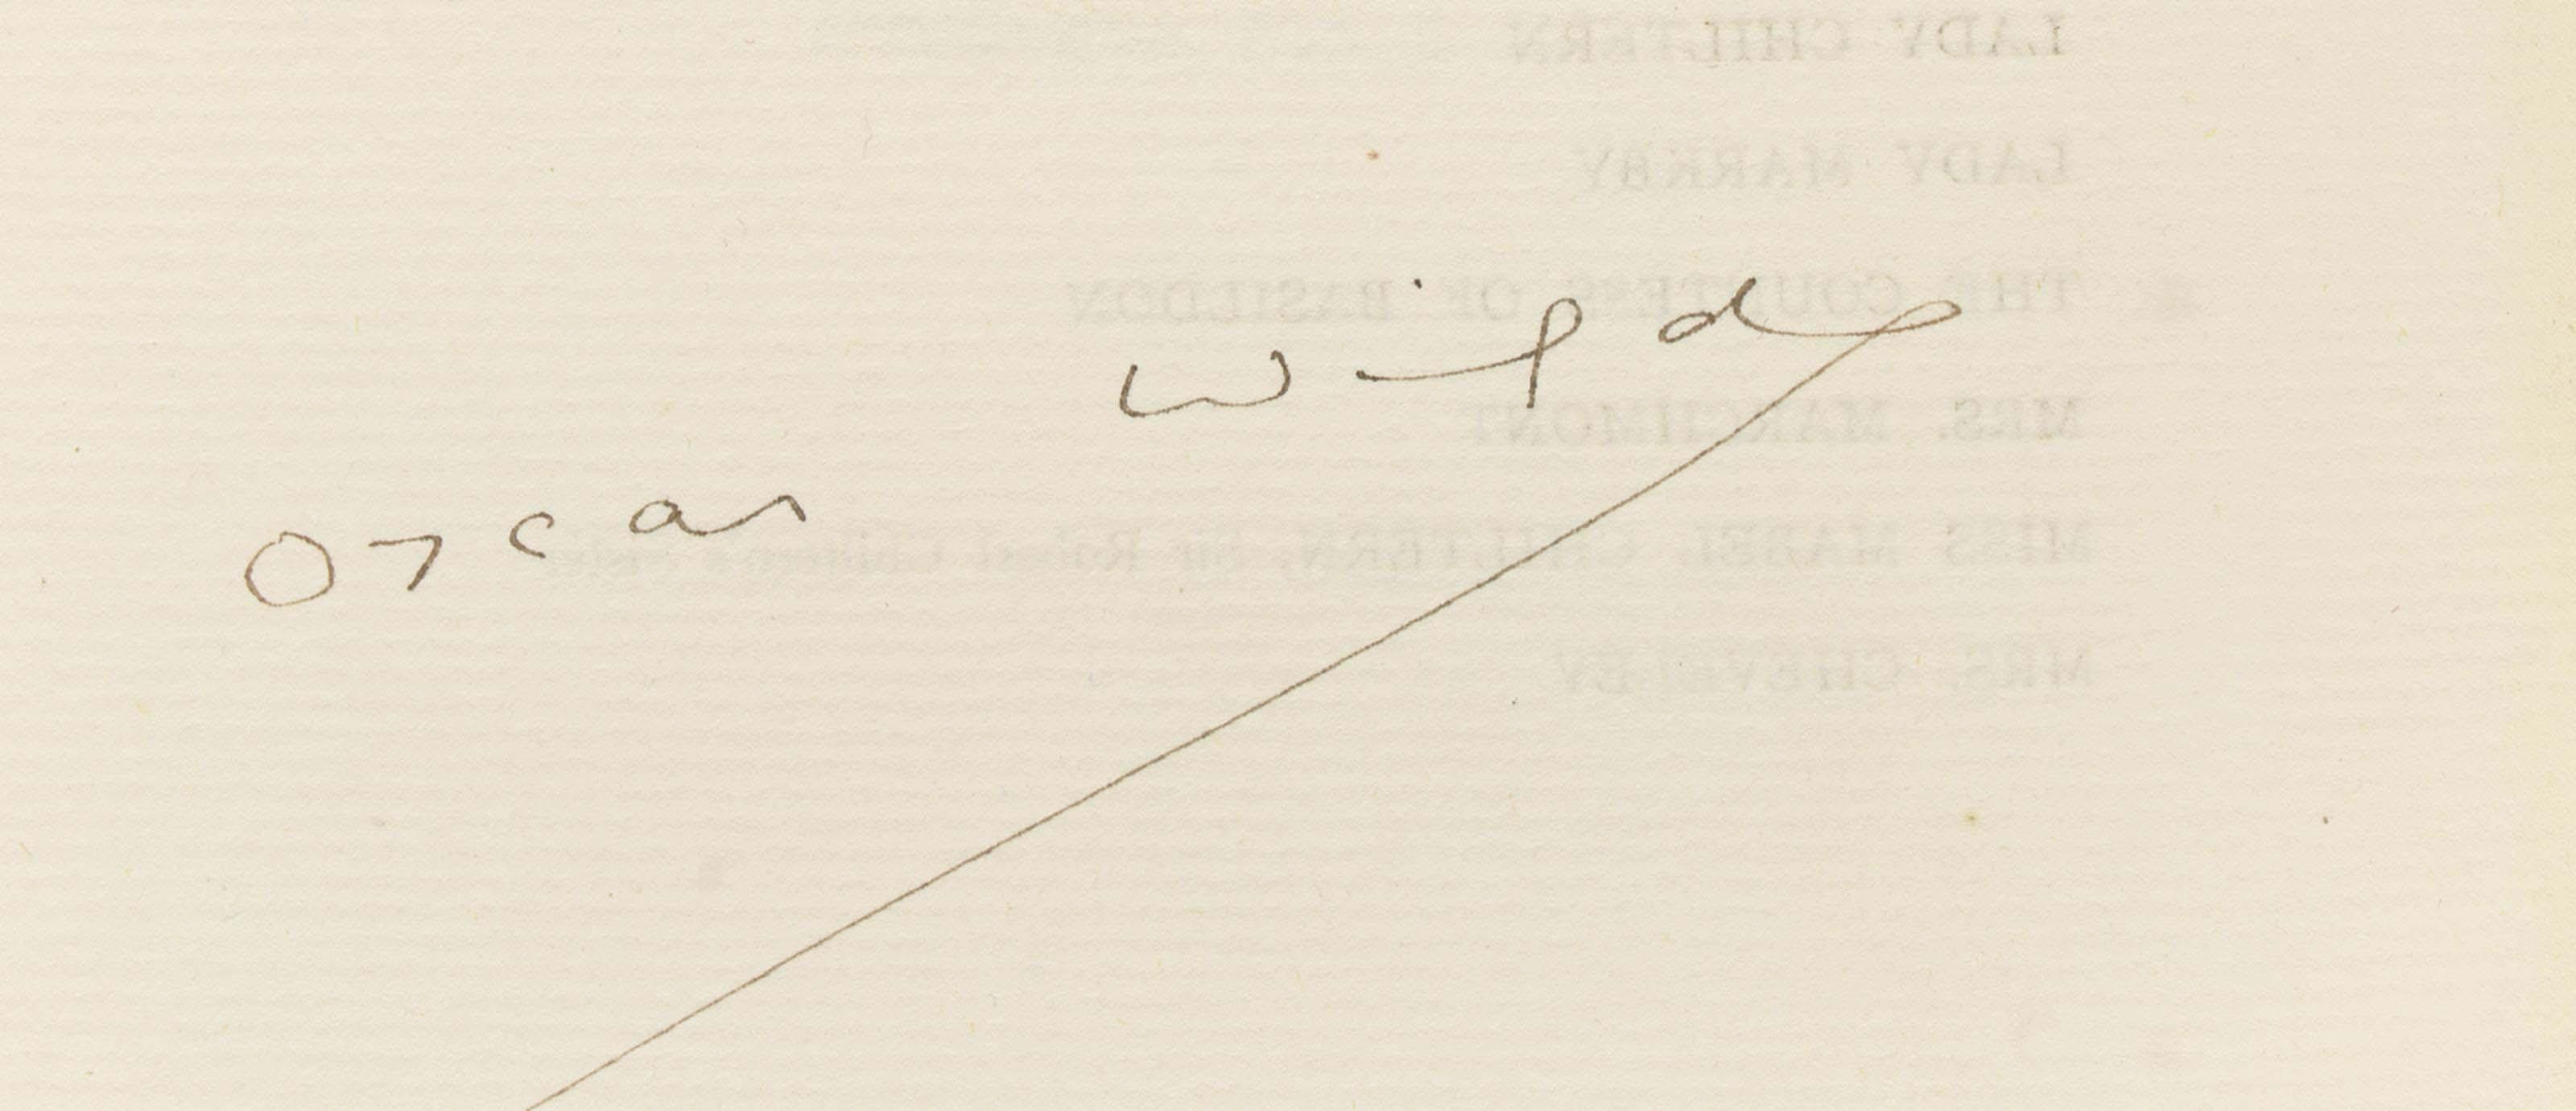 WILDE, Oscar Fingal O'Flahertie Wills (1854-1900). An Ideal Husband. London: Leonard Smithers and Co., 1899.